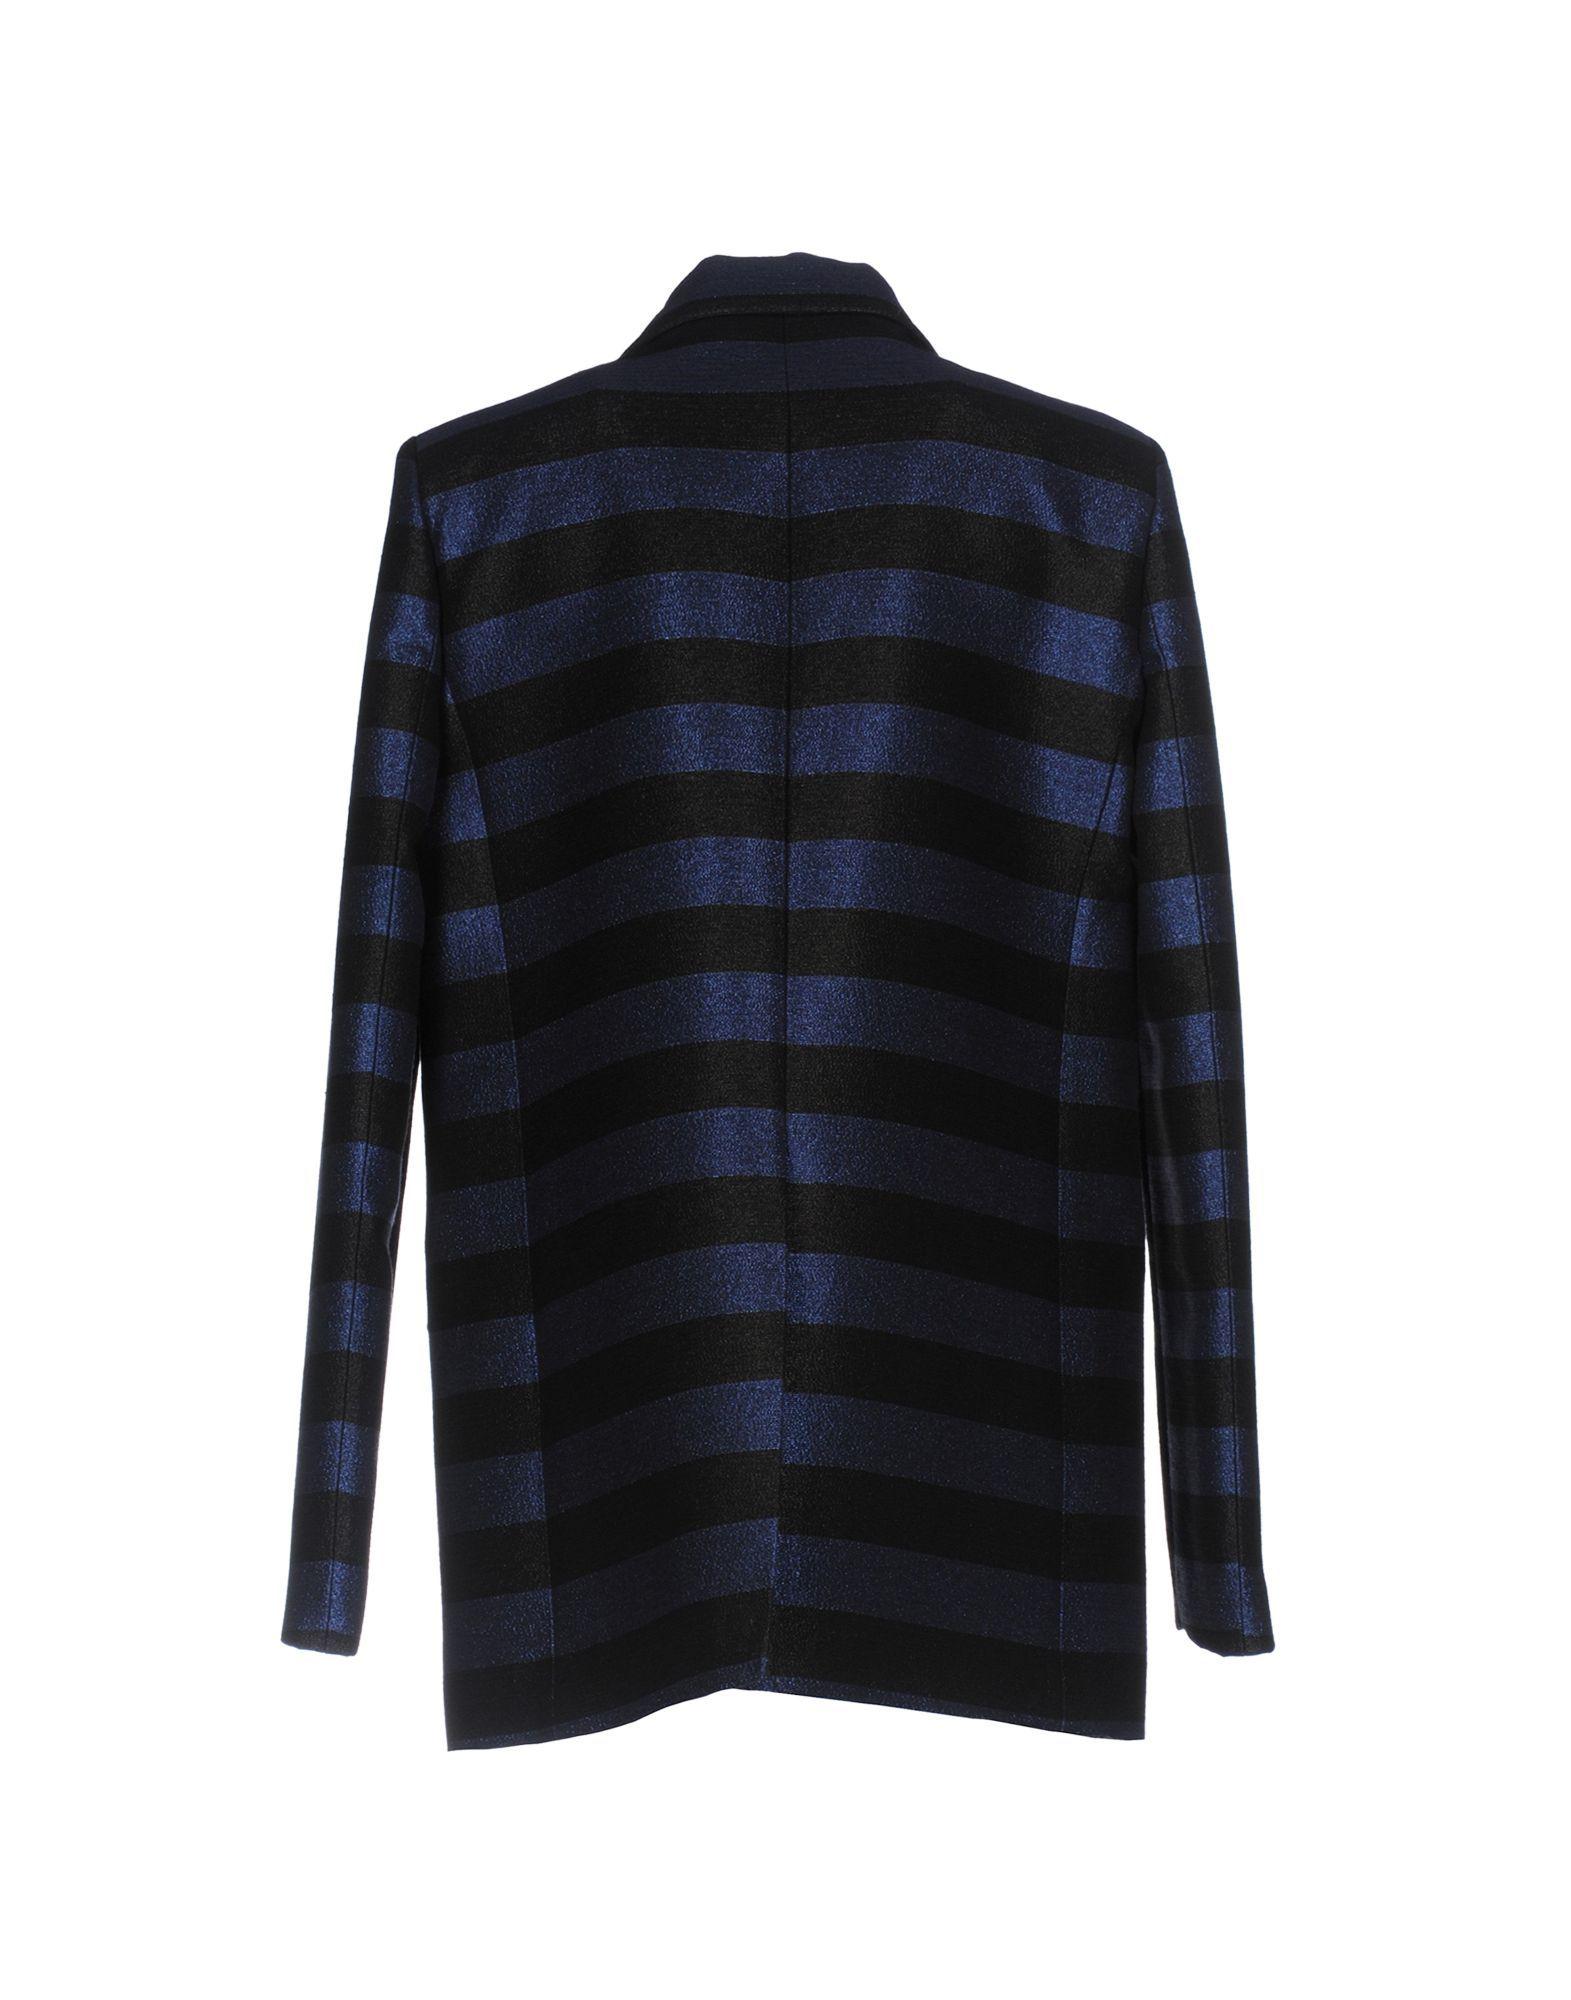 Iceberg Dark Blue Cotton Lame Single Breasted Jacket